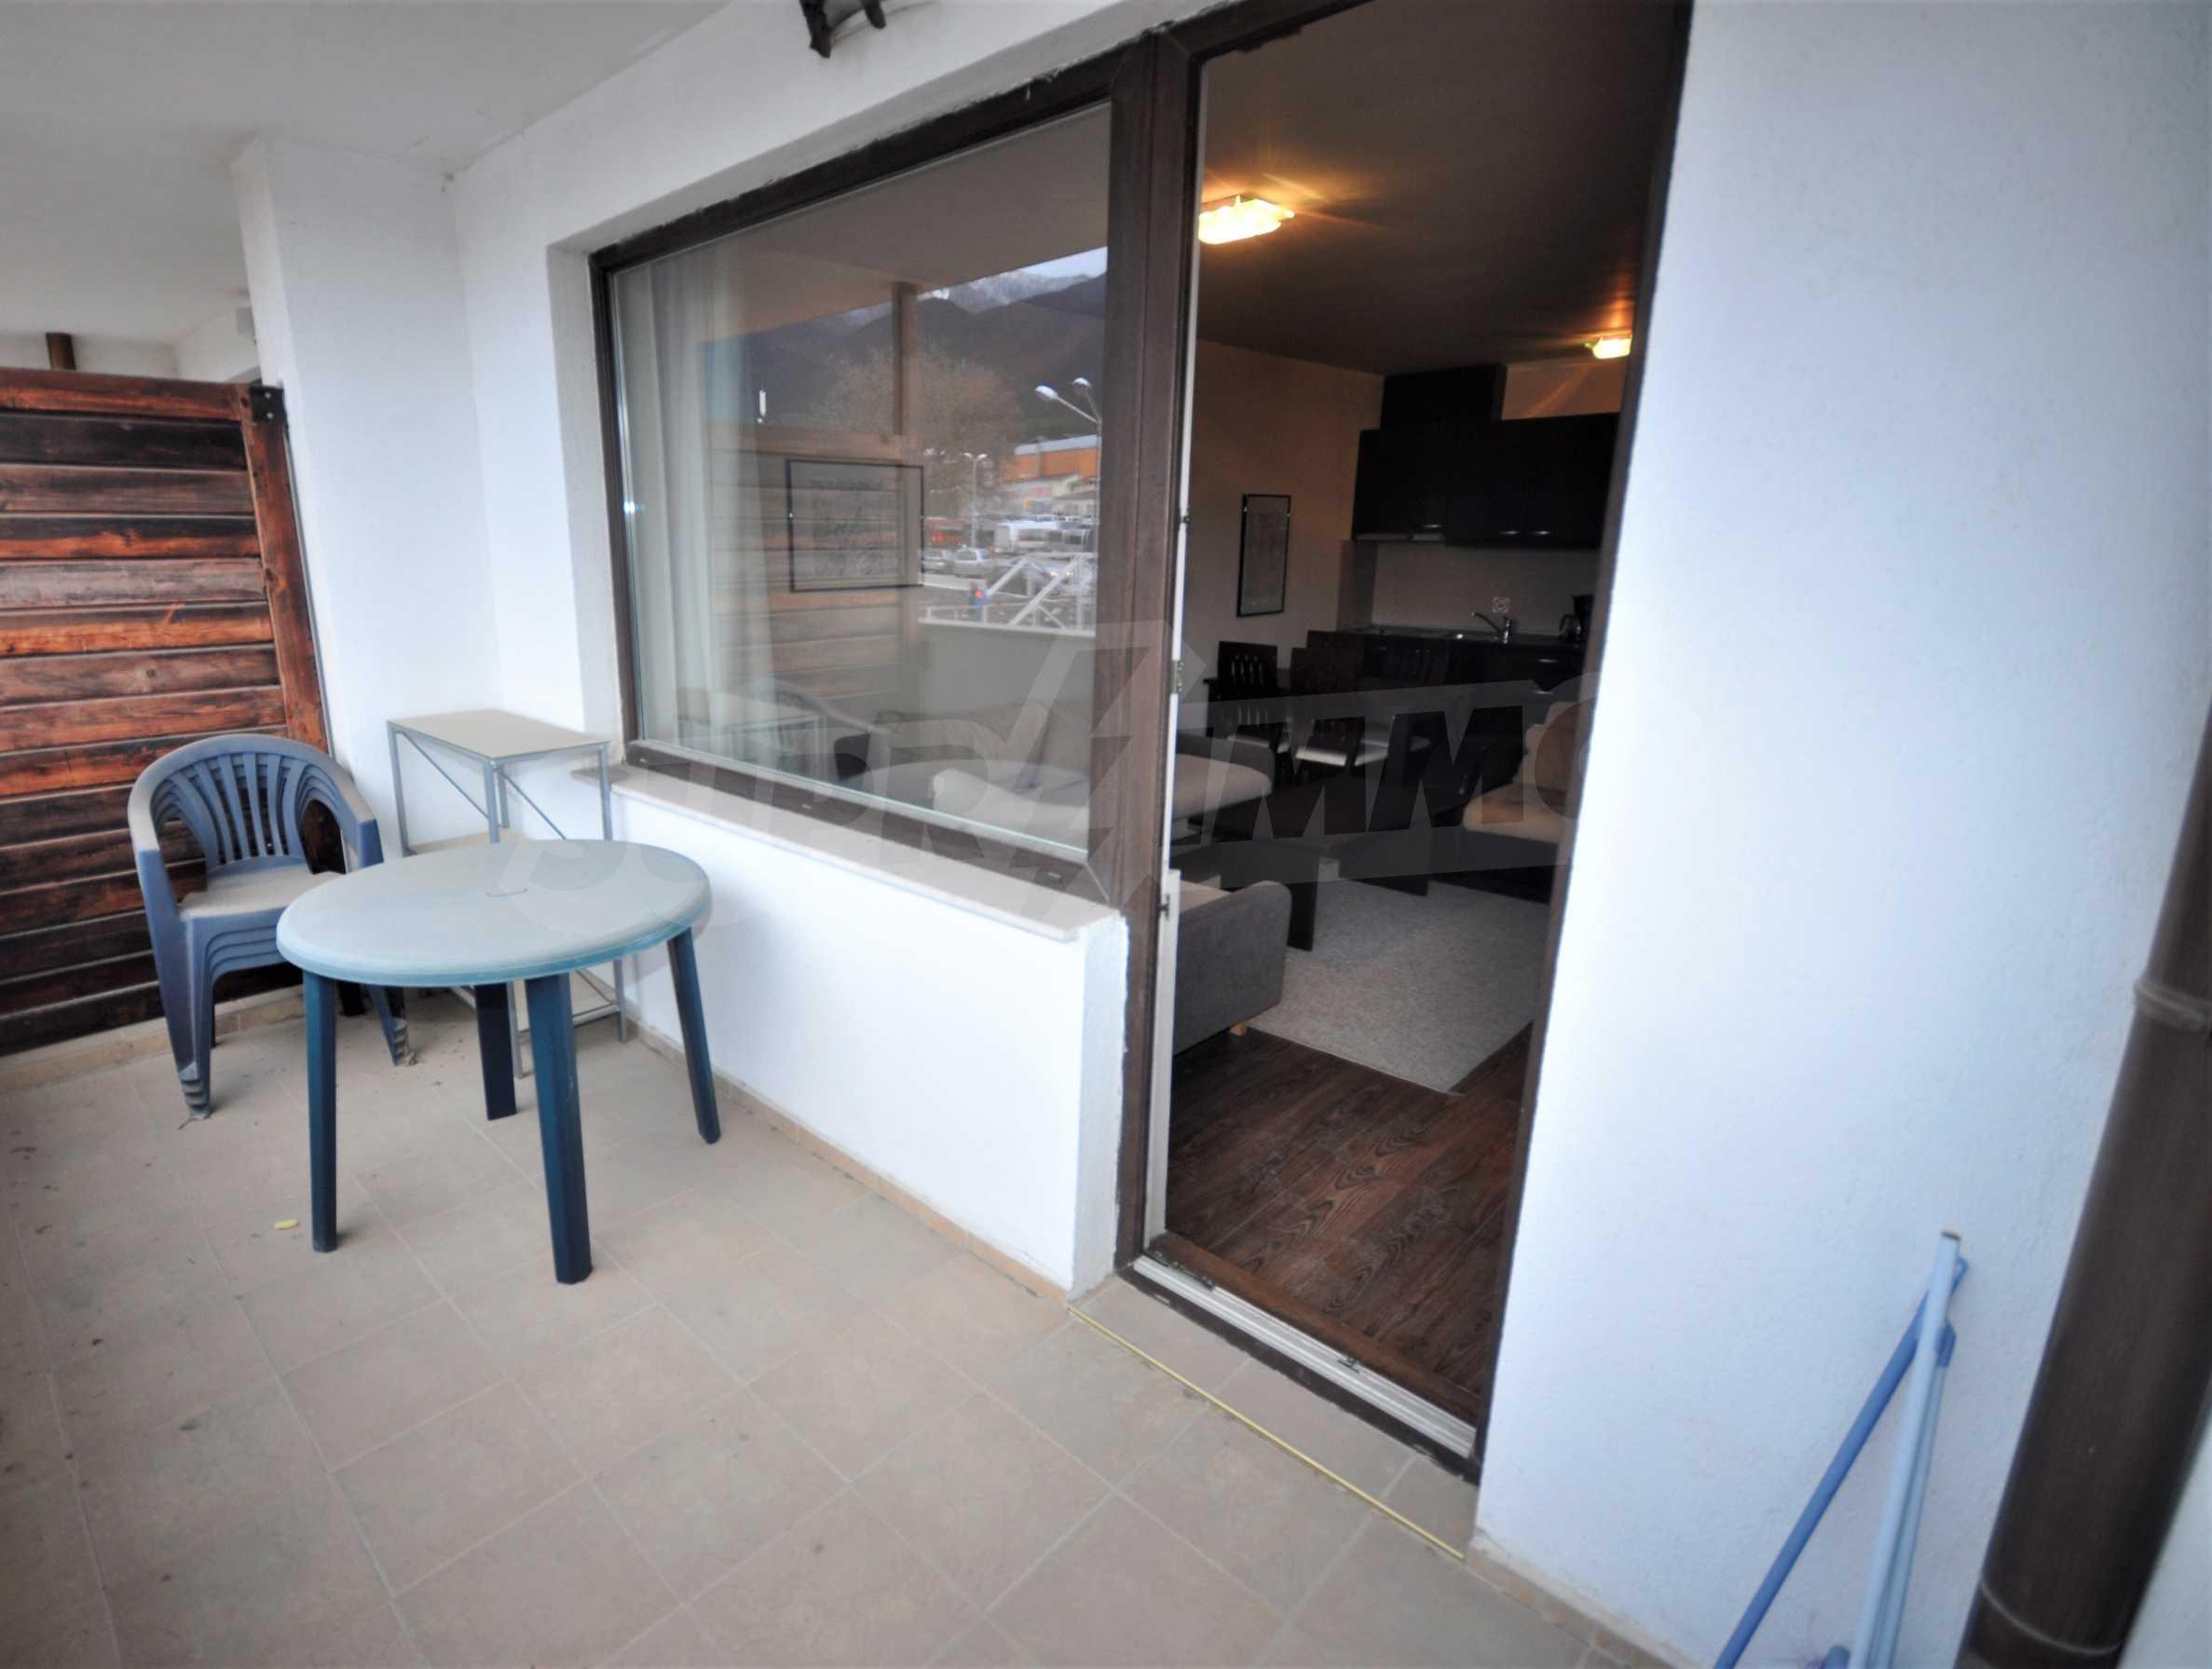 Spacious two-bedroom apartment near the ski lift in Bansko 5